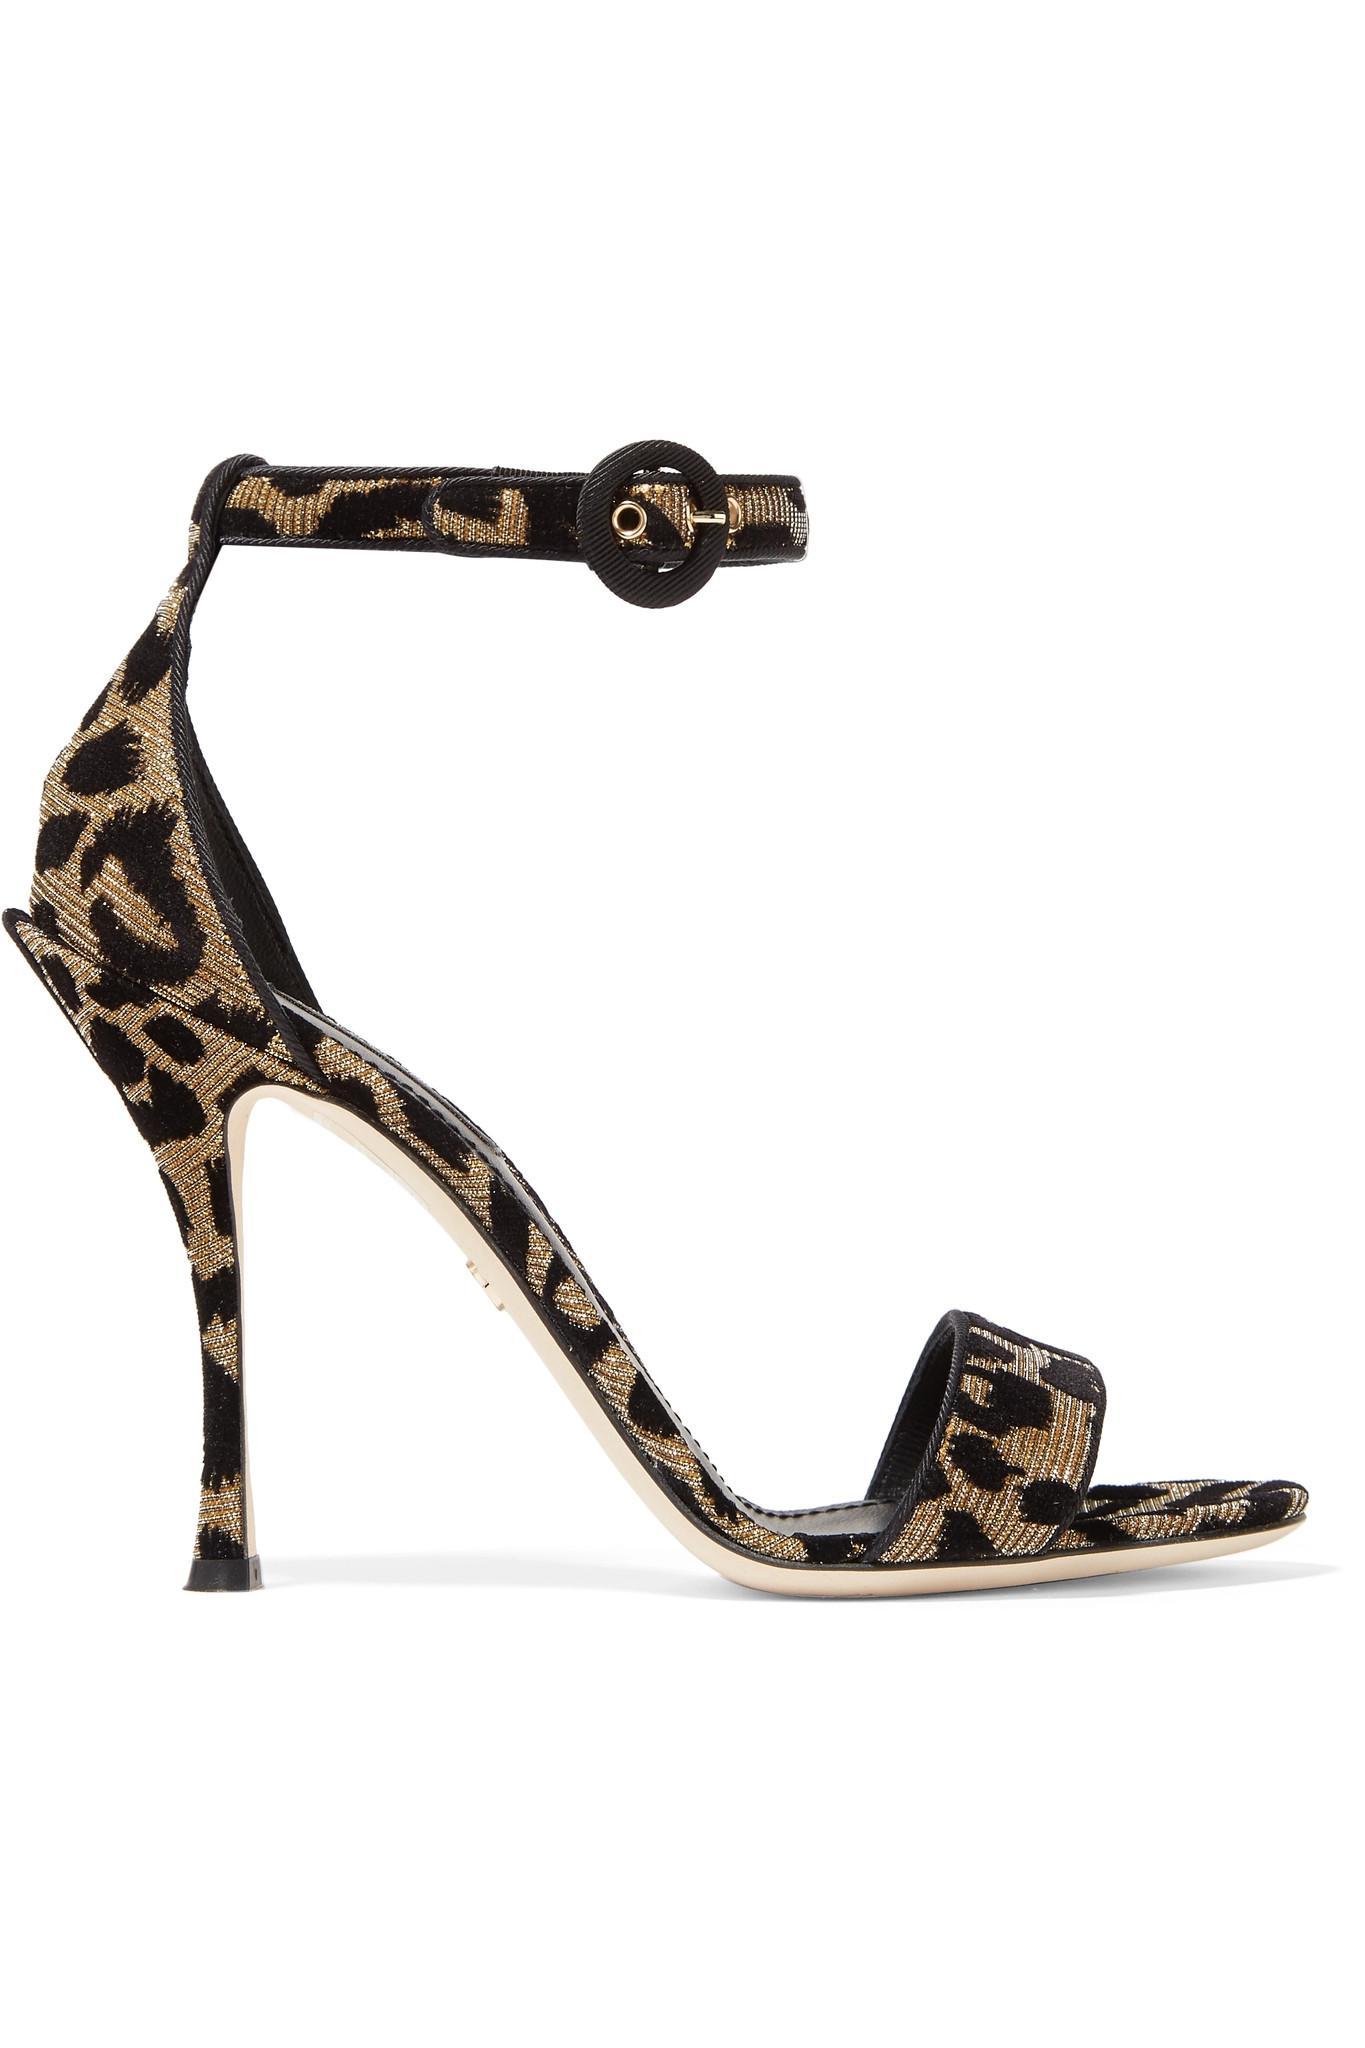 Flocked Metallic Canvas Platform Sandals - Leopard print Dolce & Gabbana Clearance Choice Cheap Online Store Explore For Sale Get iofsdlm